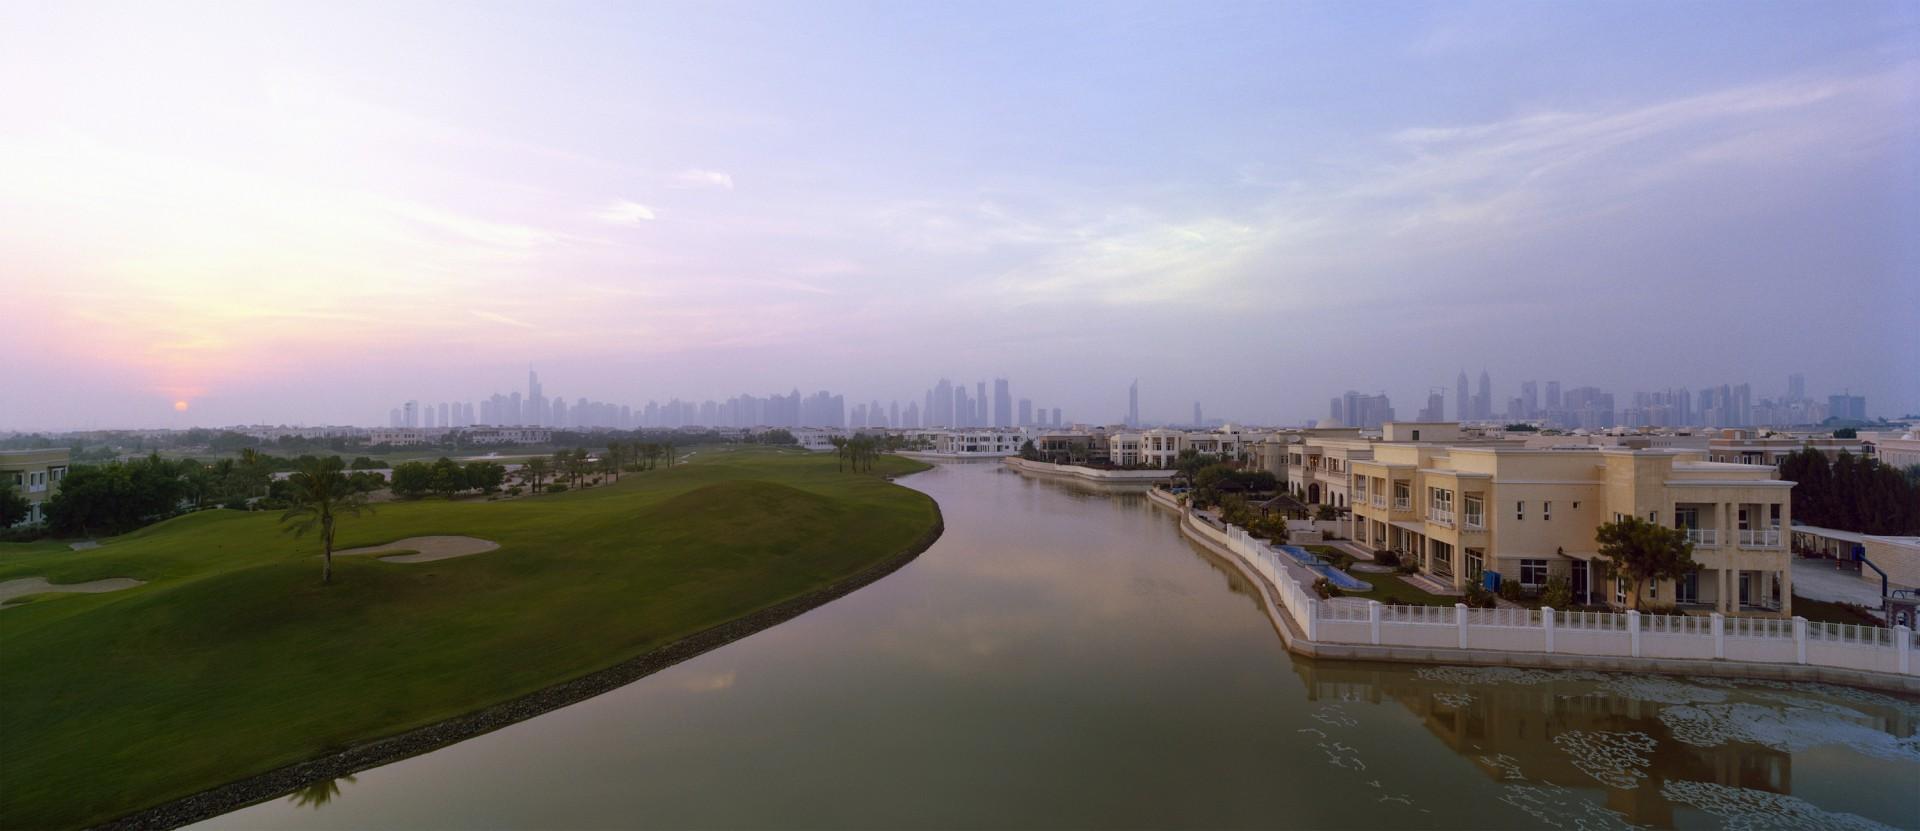 "Die Community. 25°04'41""N, 55°09'23""E: Emirates Hills, Gated Community, 2010, 150 x 64cm"